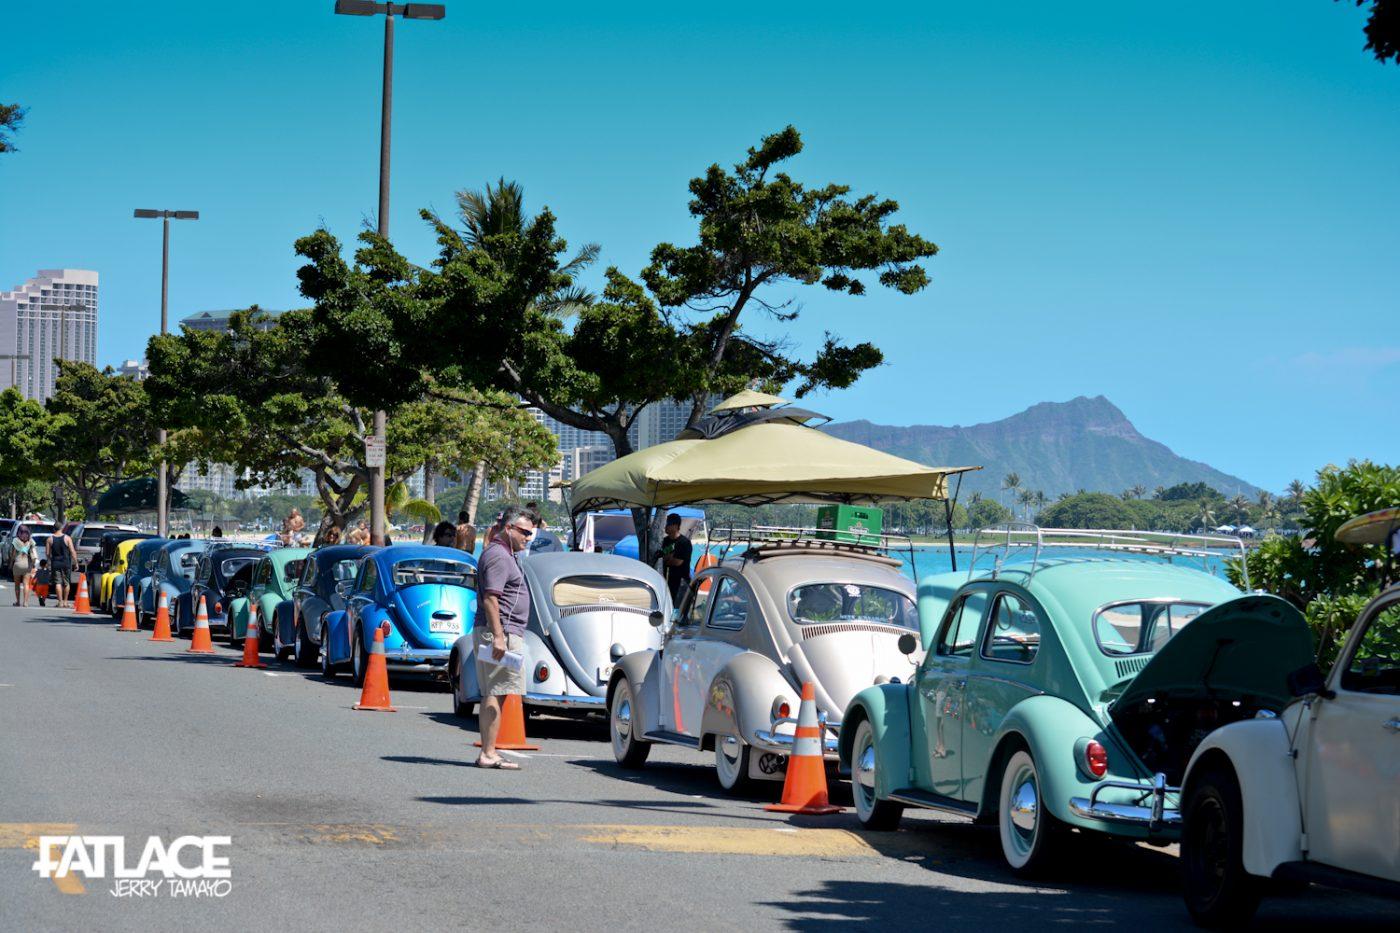 VW CLUB Of HAWAII Shaka Weekend Fatlace Since - Vw car show this weekend